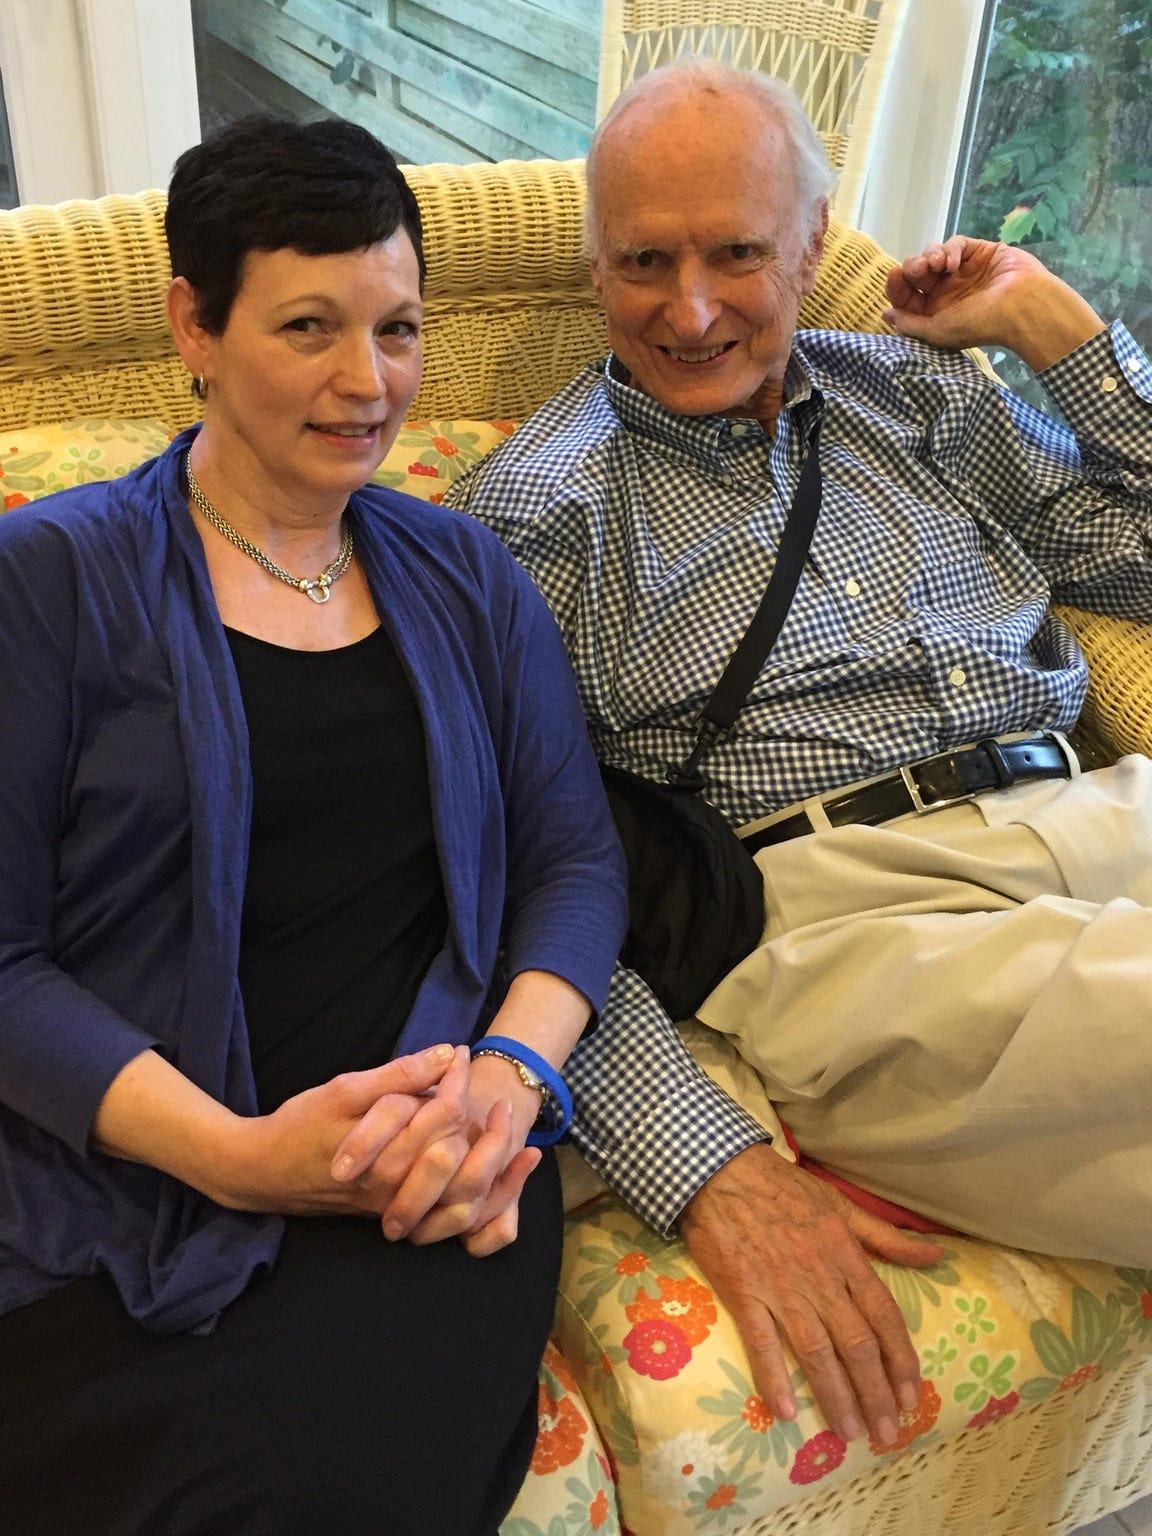 Beverly and Bill Hudnut on June 12, 2015.